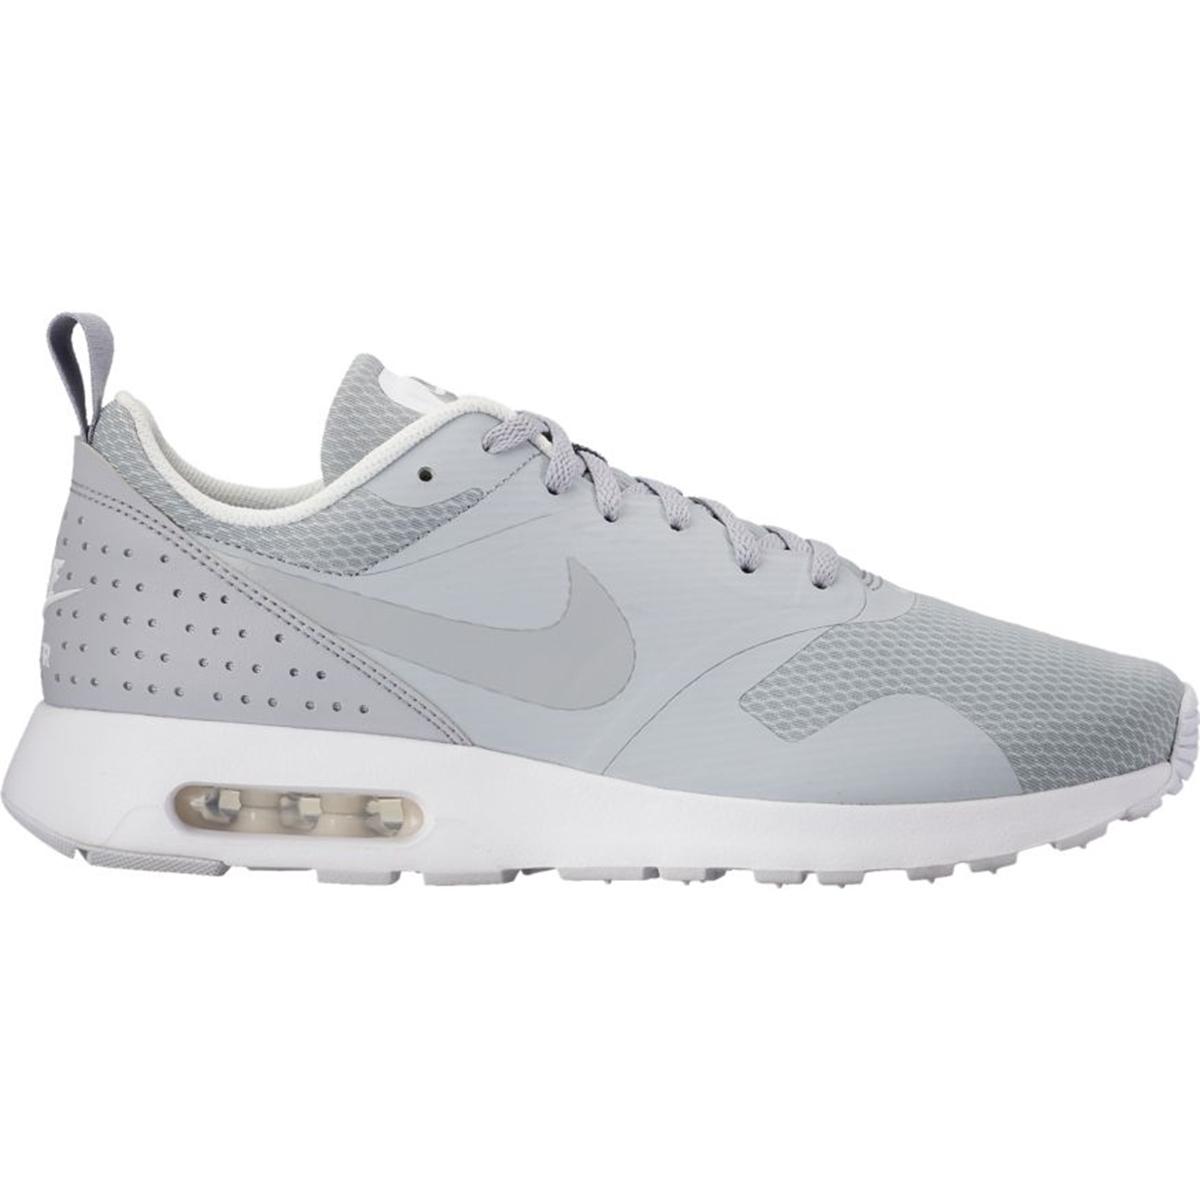 sports shoes 61ad3 87401 Bilde av Nike NIKE AIR MAX TAVAS wolf grey